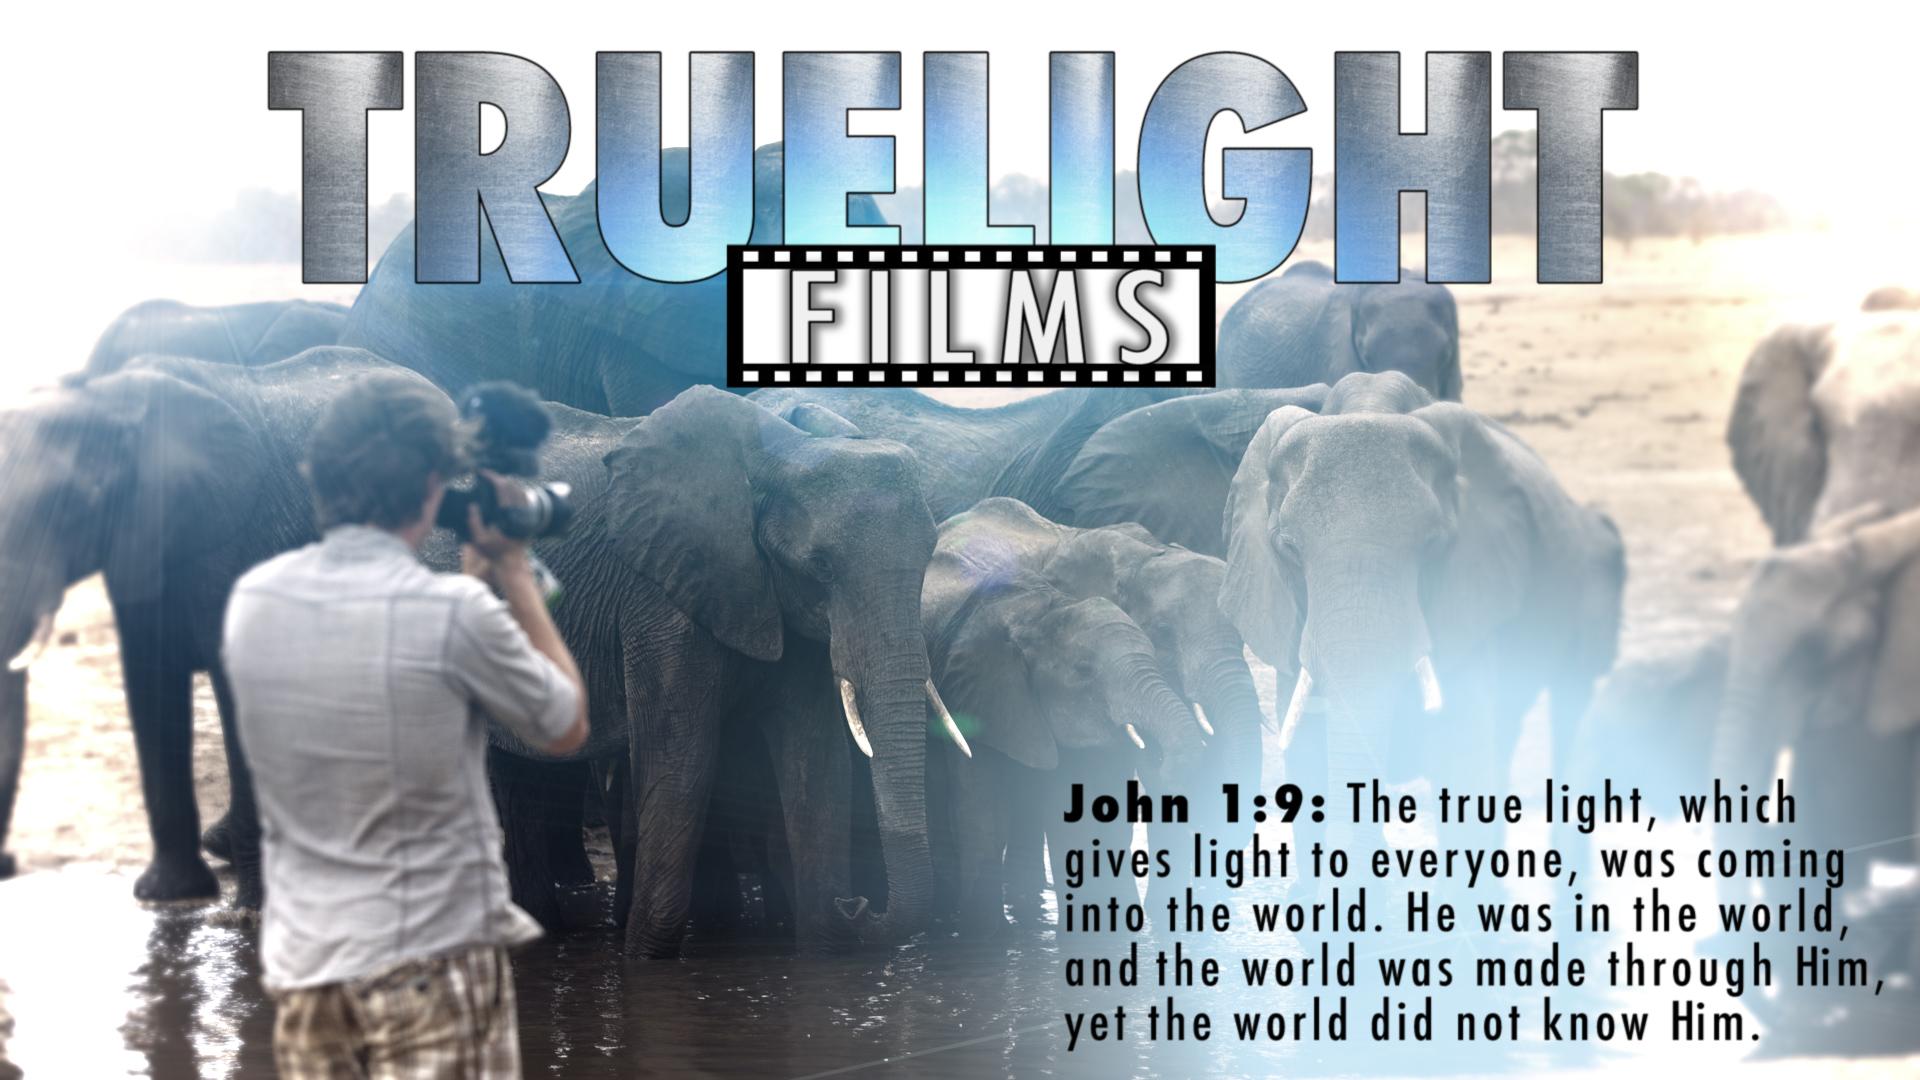 Truelight films frontpage